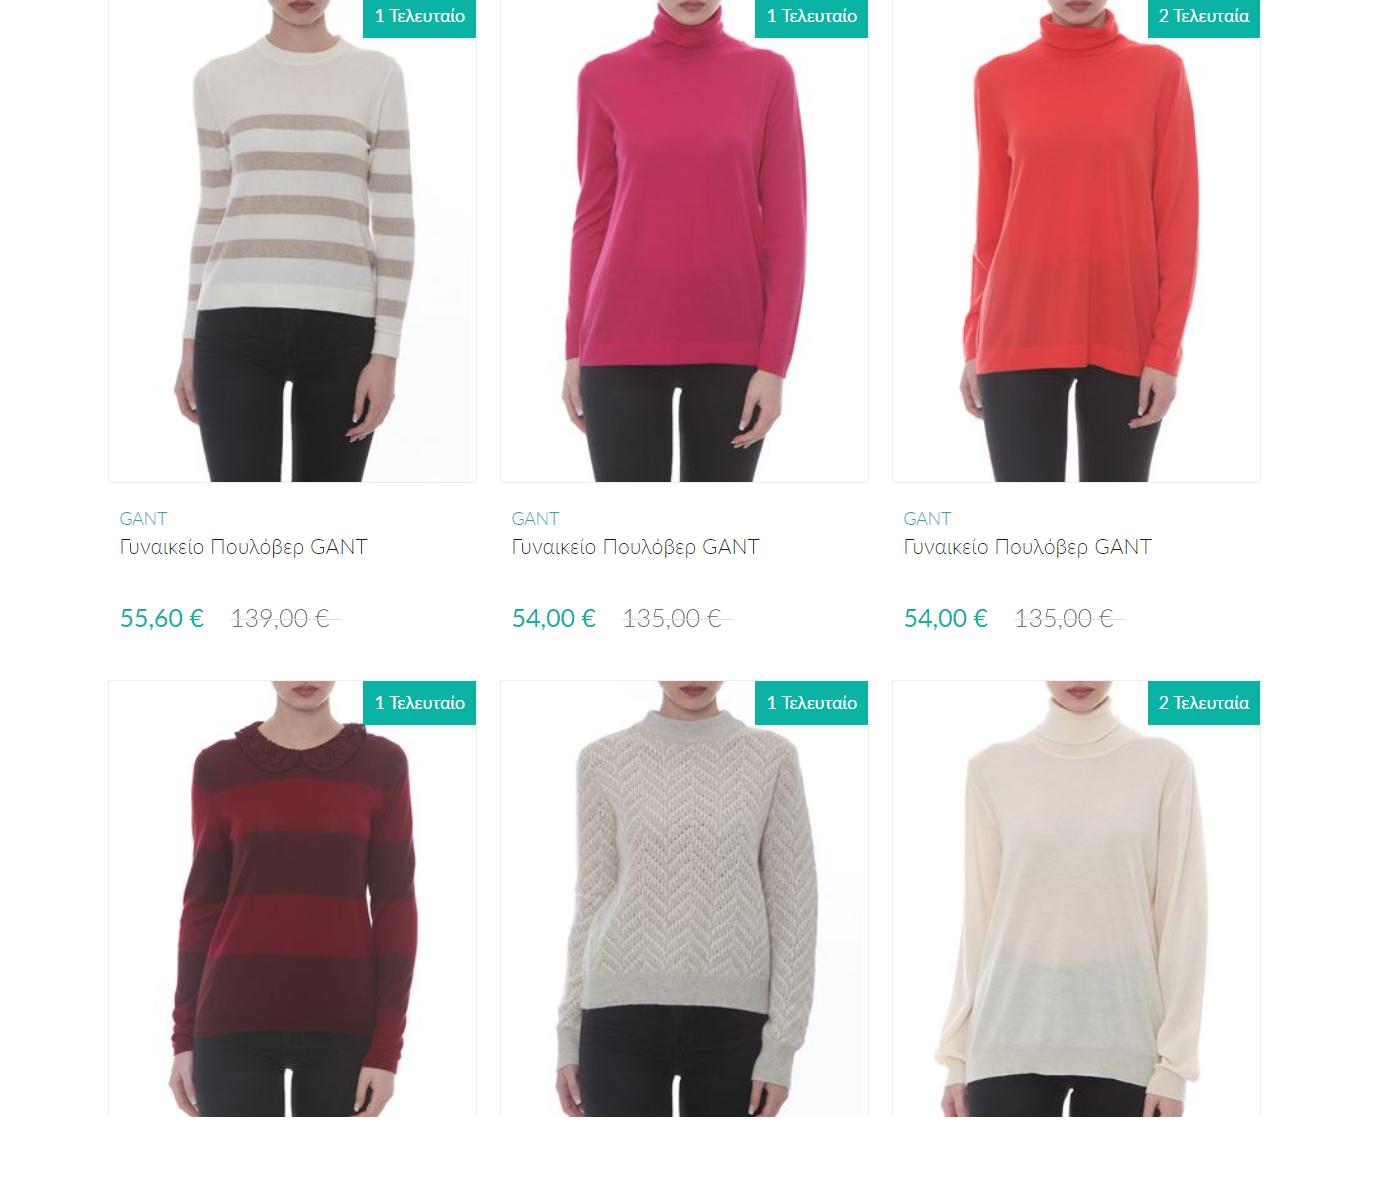 c3f2587219d Εκπτώσεις έως -80% σε γυναικεία ρούχα GANT & IMPACT στο brandsGalaxy